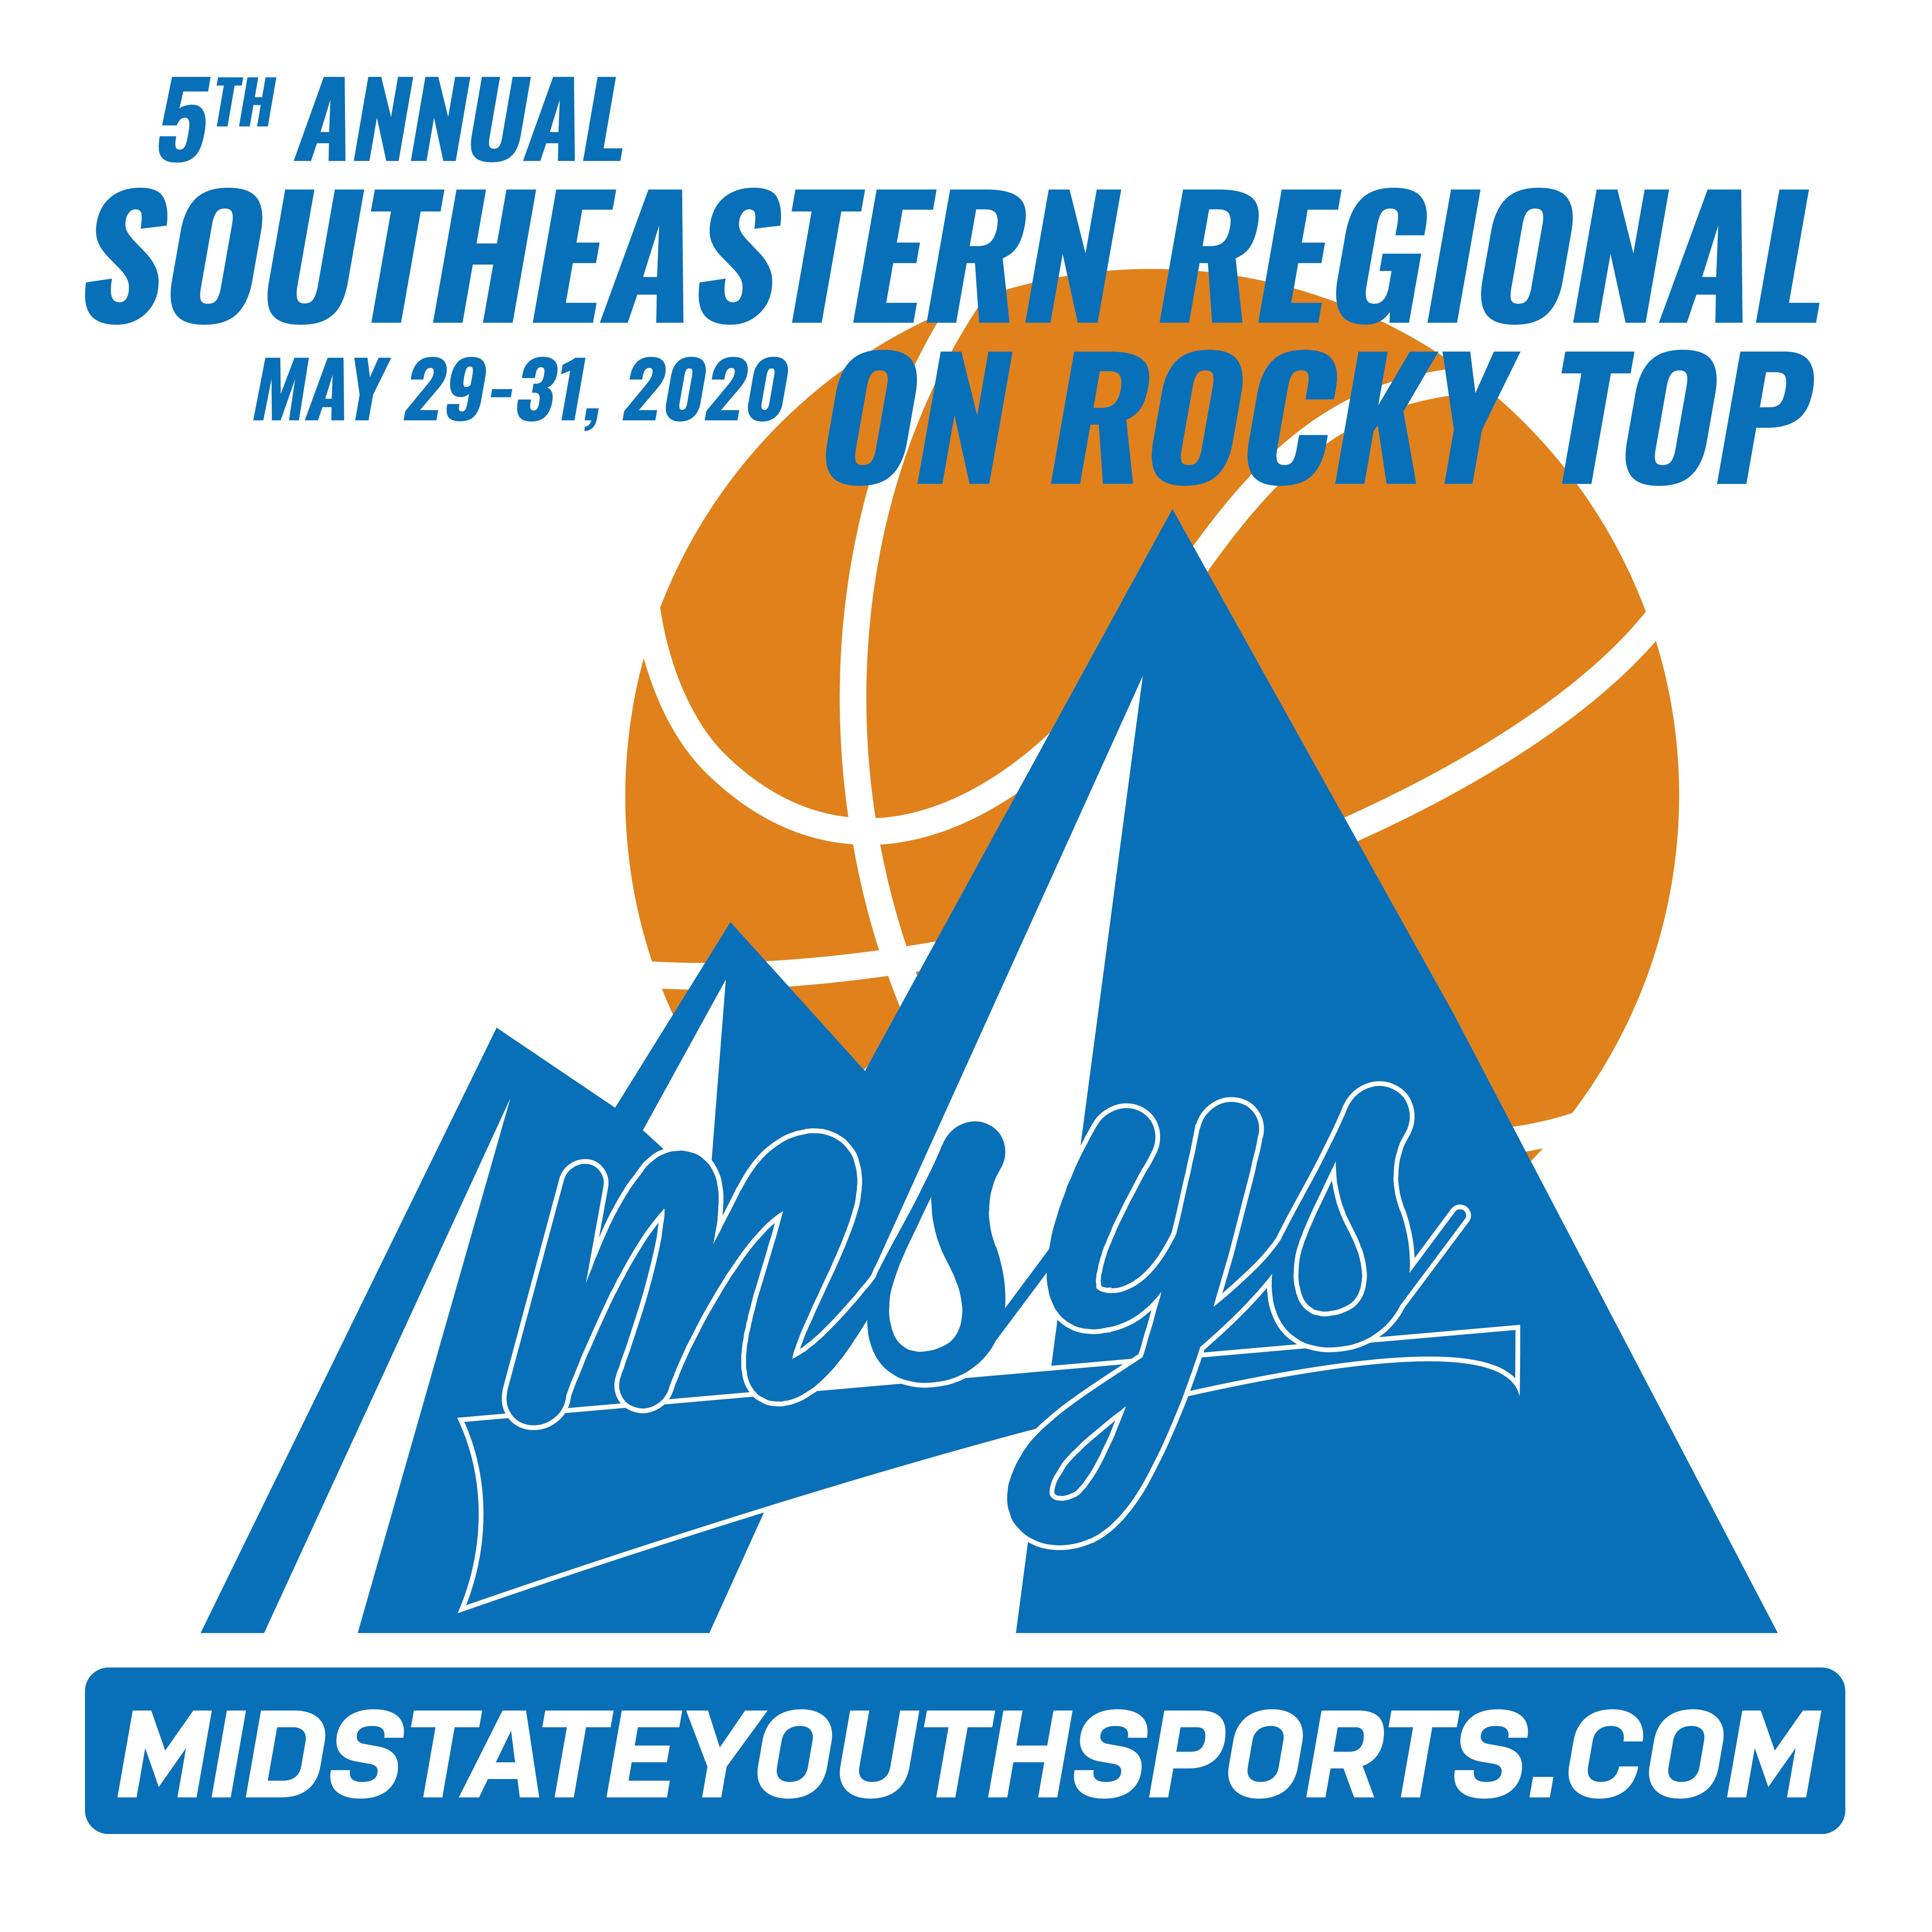 MSYS 5th Annual Southeastern Regional on Rocky Top